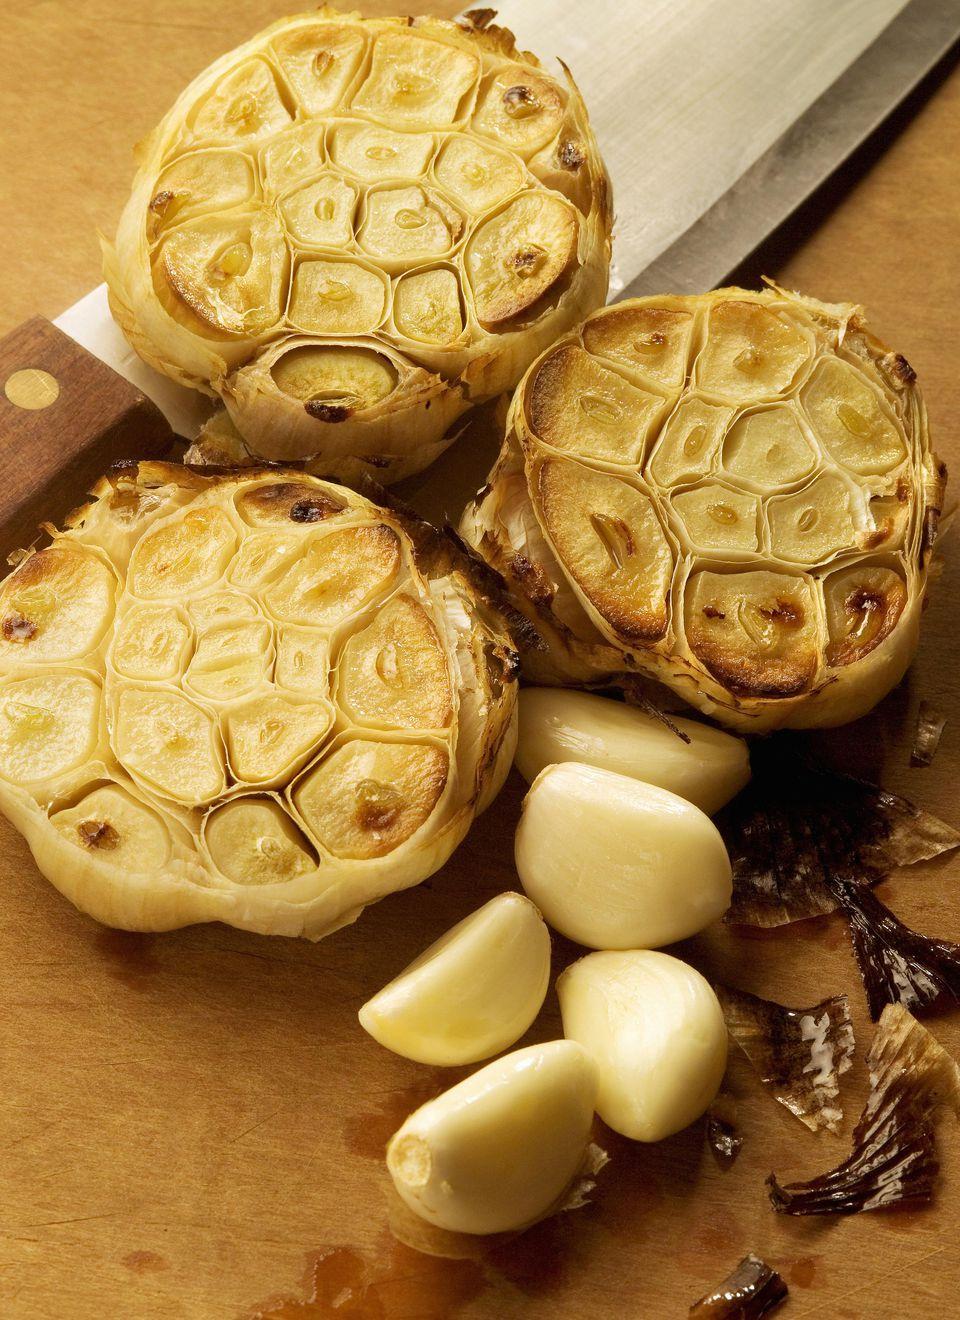 Roasted Garlic Marinade